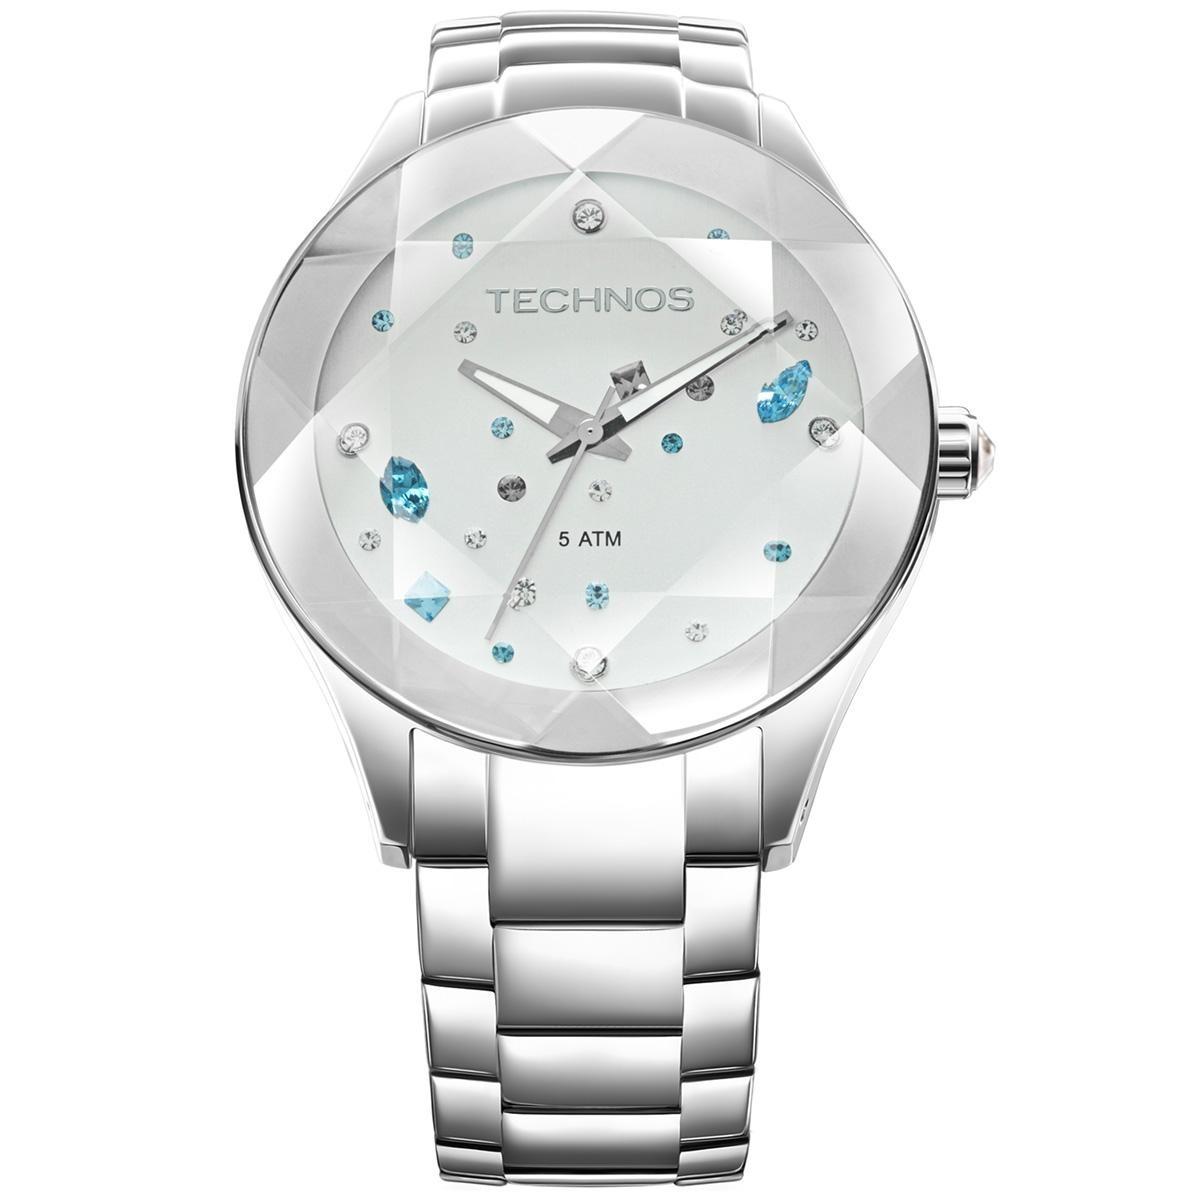 fe162accdcc Relógio Feminino Technos Elegance Crystal 2039avdtm 1k Prata - R ...